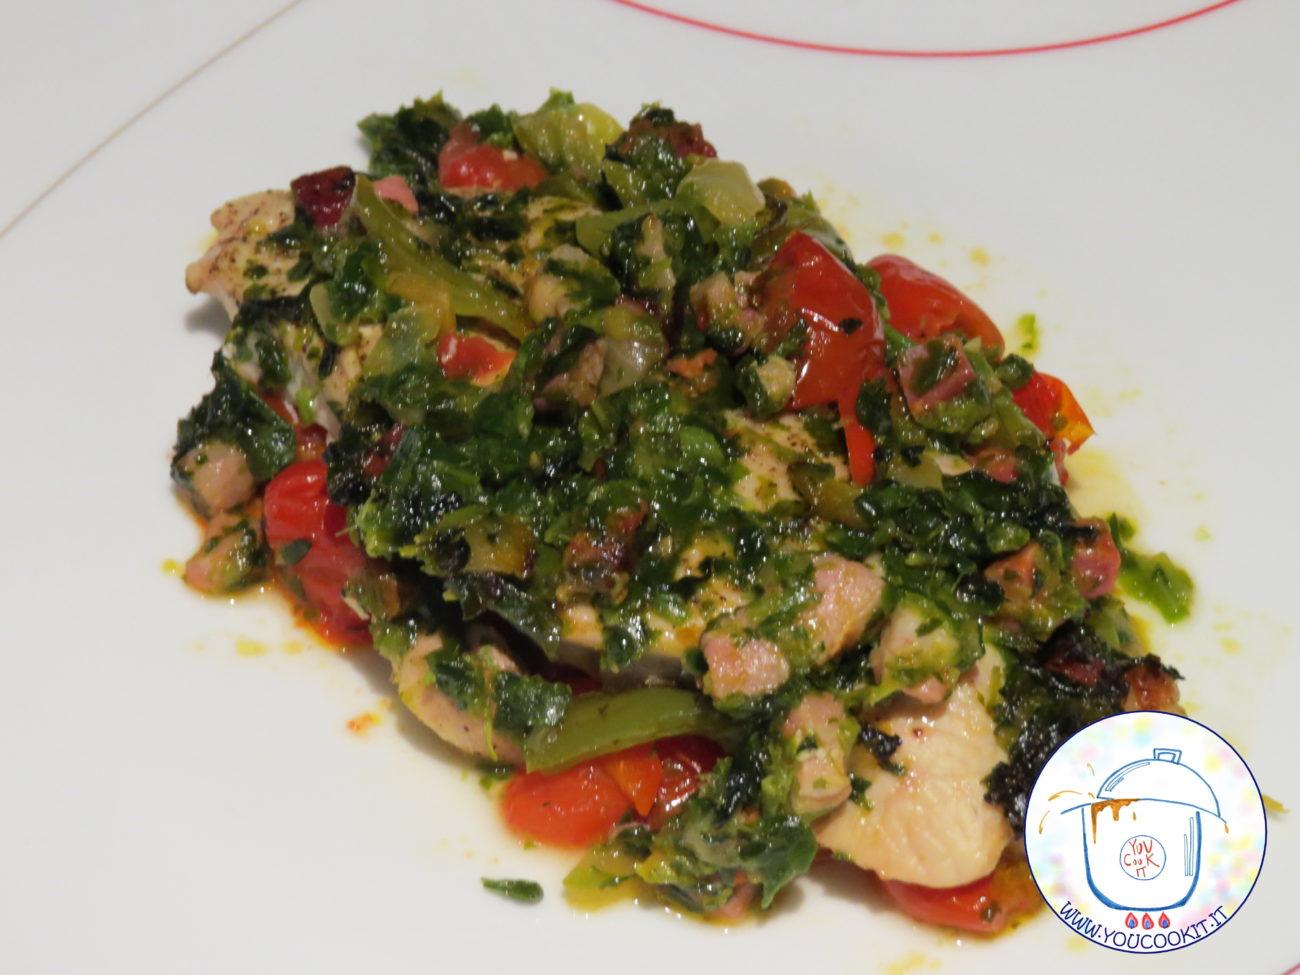 Pollo con spinaci e peperoni